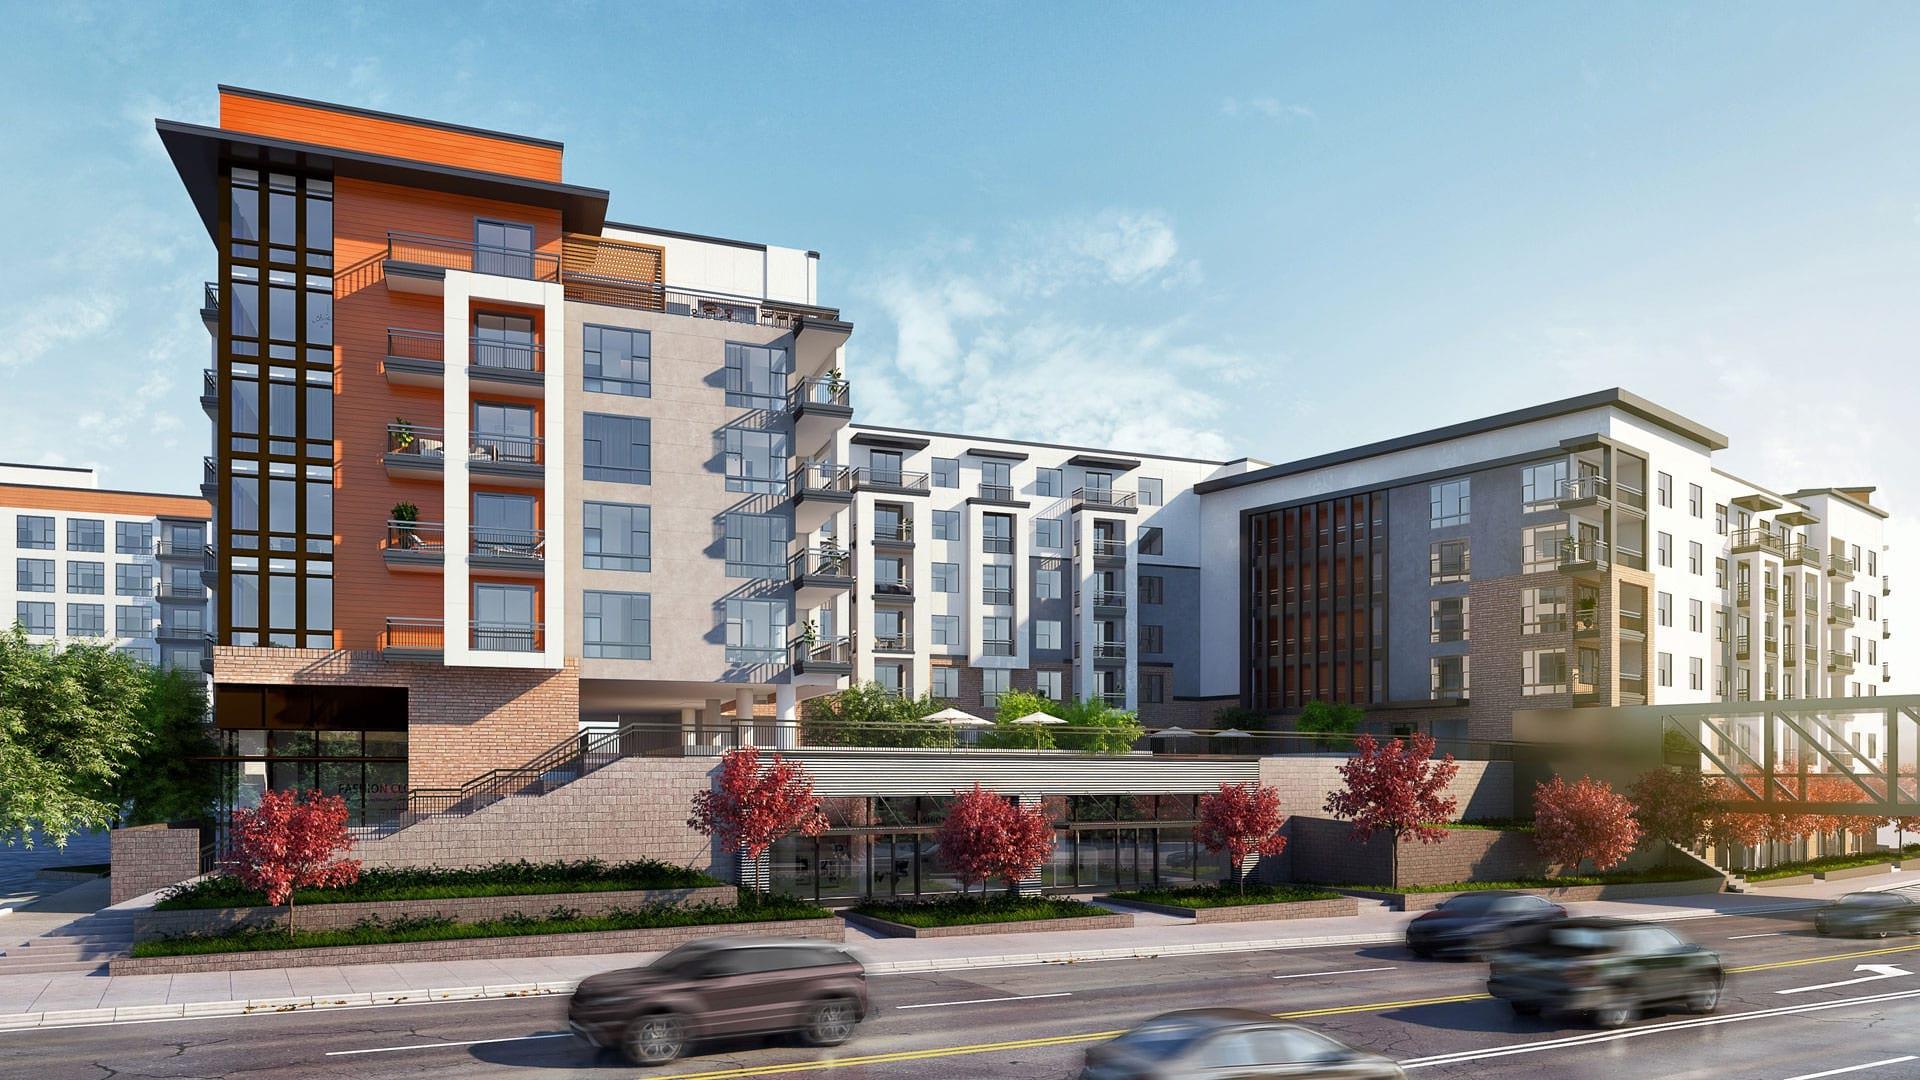 Picture of Cortland Decatur East Building Exterior